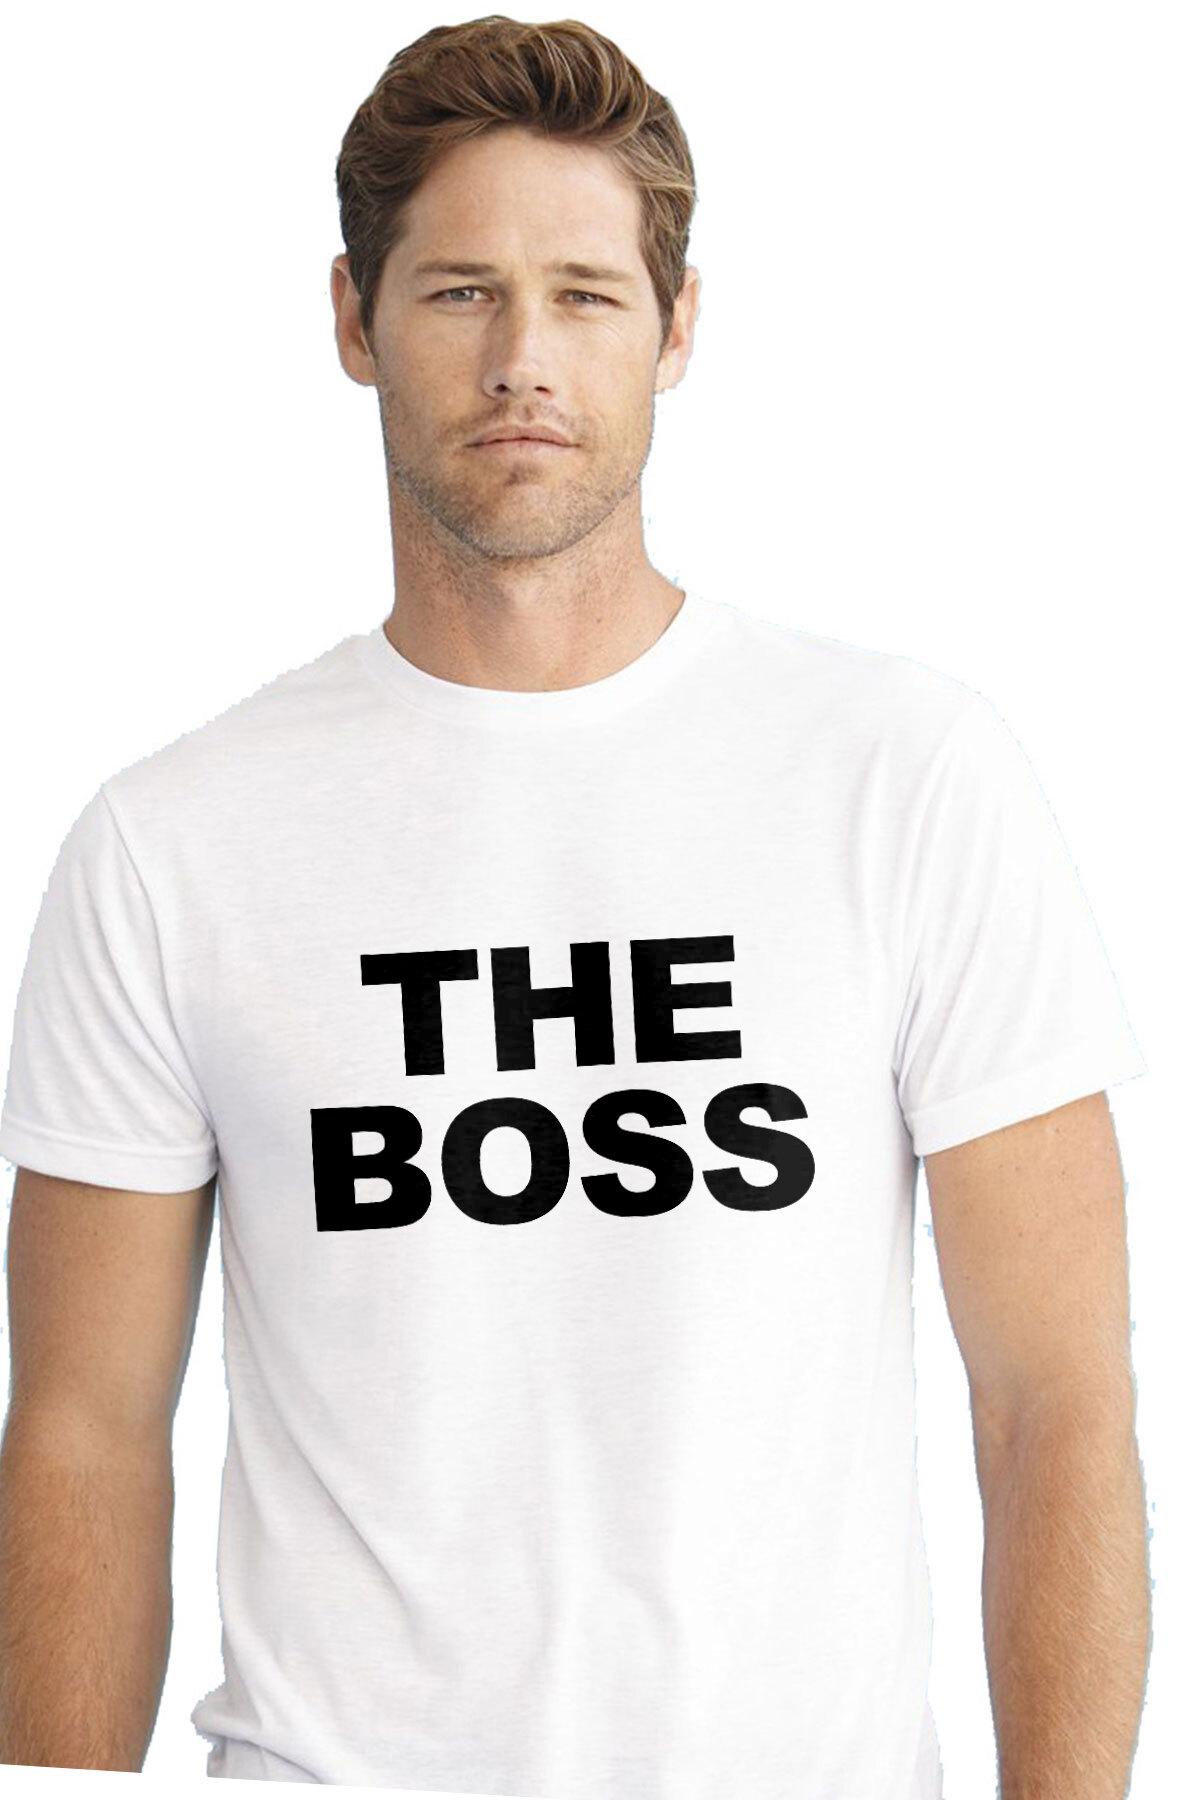 539d0cd52c The Boss - Funny couple's t-shirt